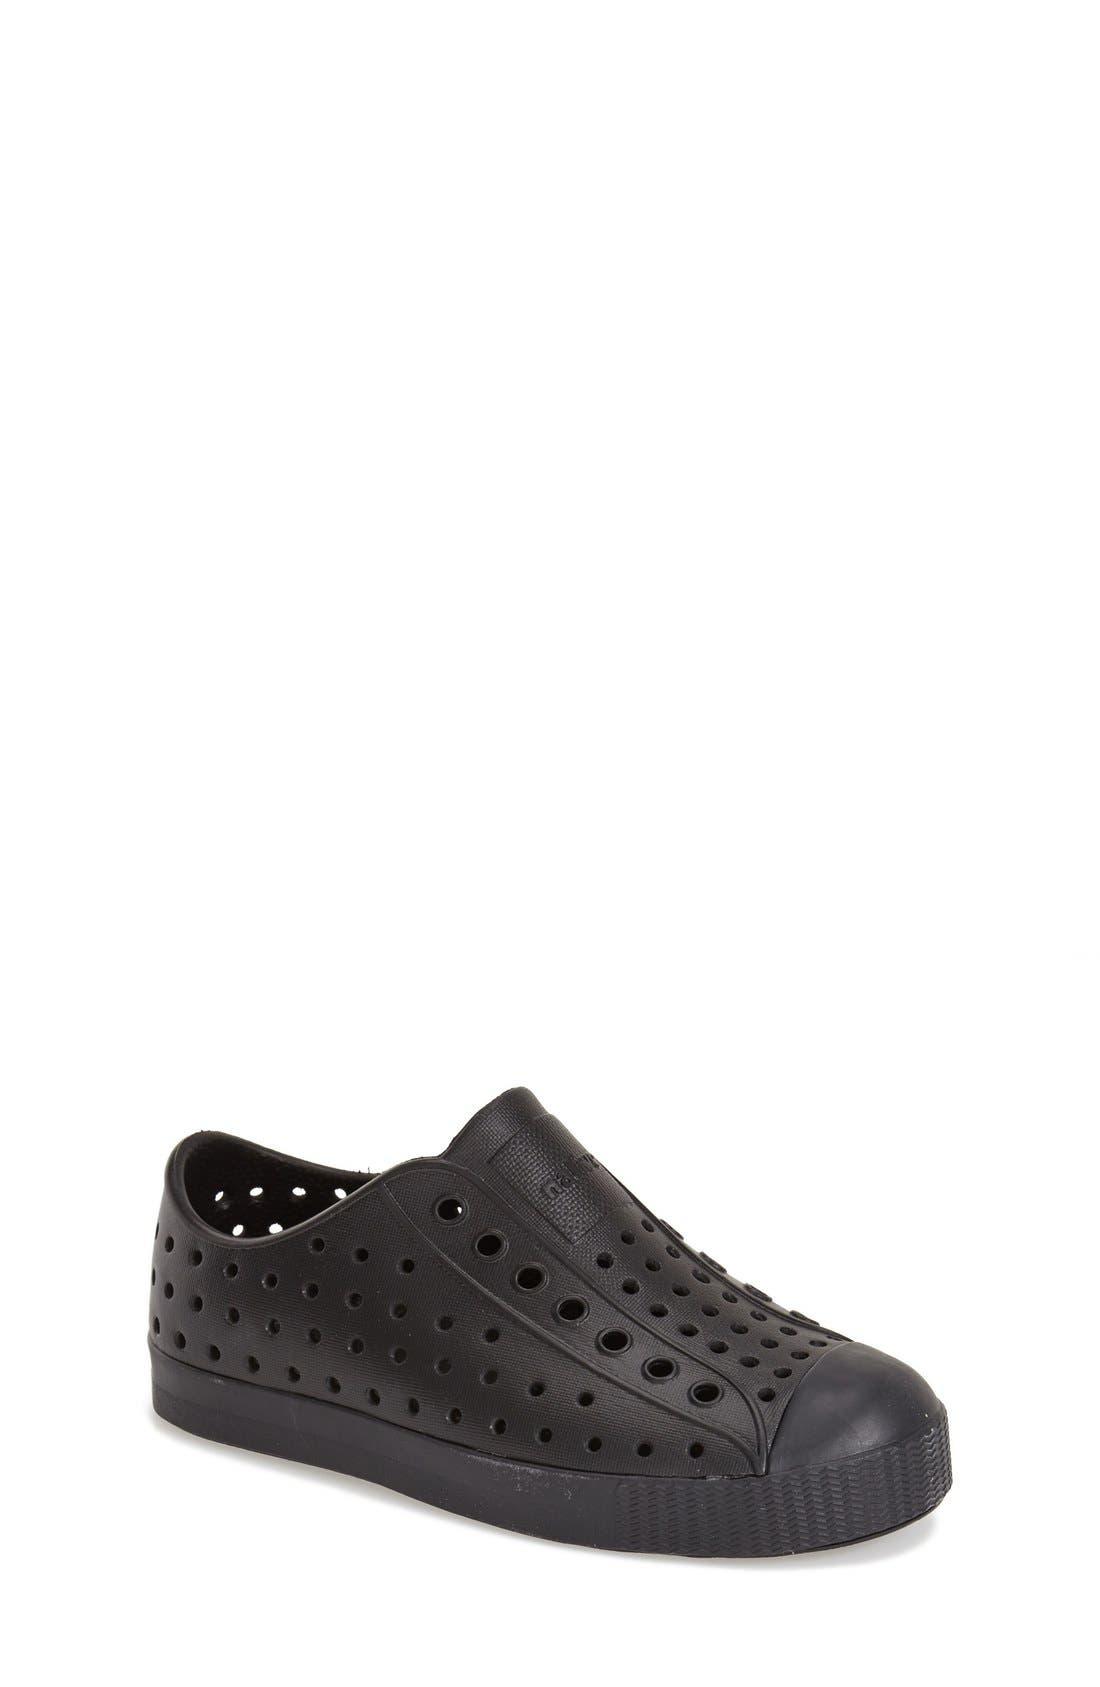 'Jefferson' Water Friendly Slip-On Sneaker,                             Main thumbnail 28, color,